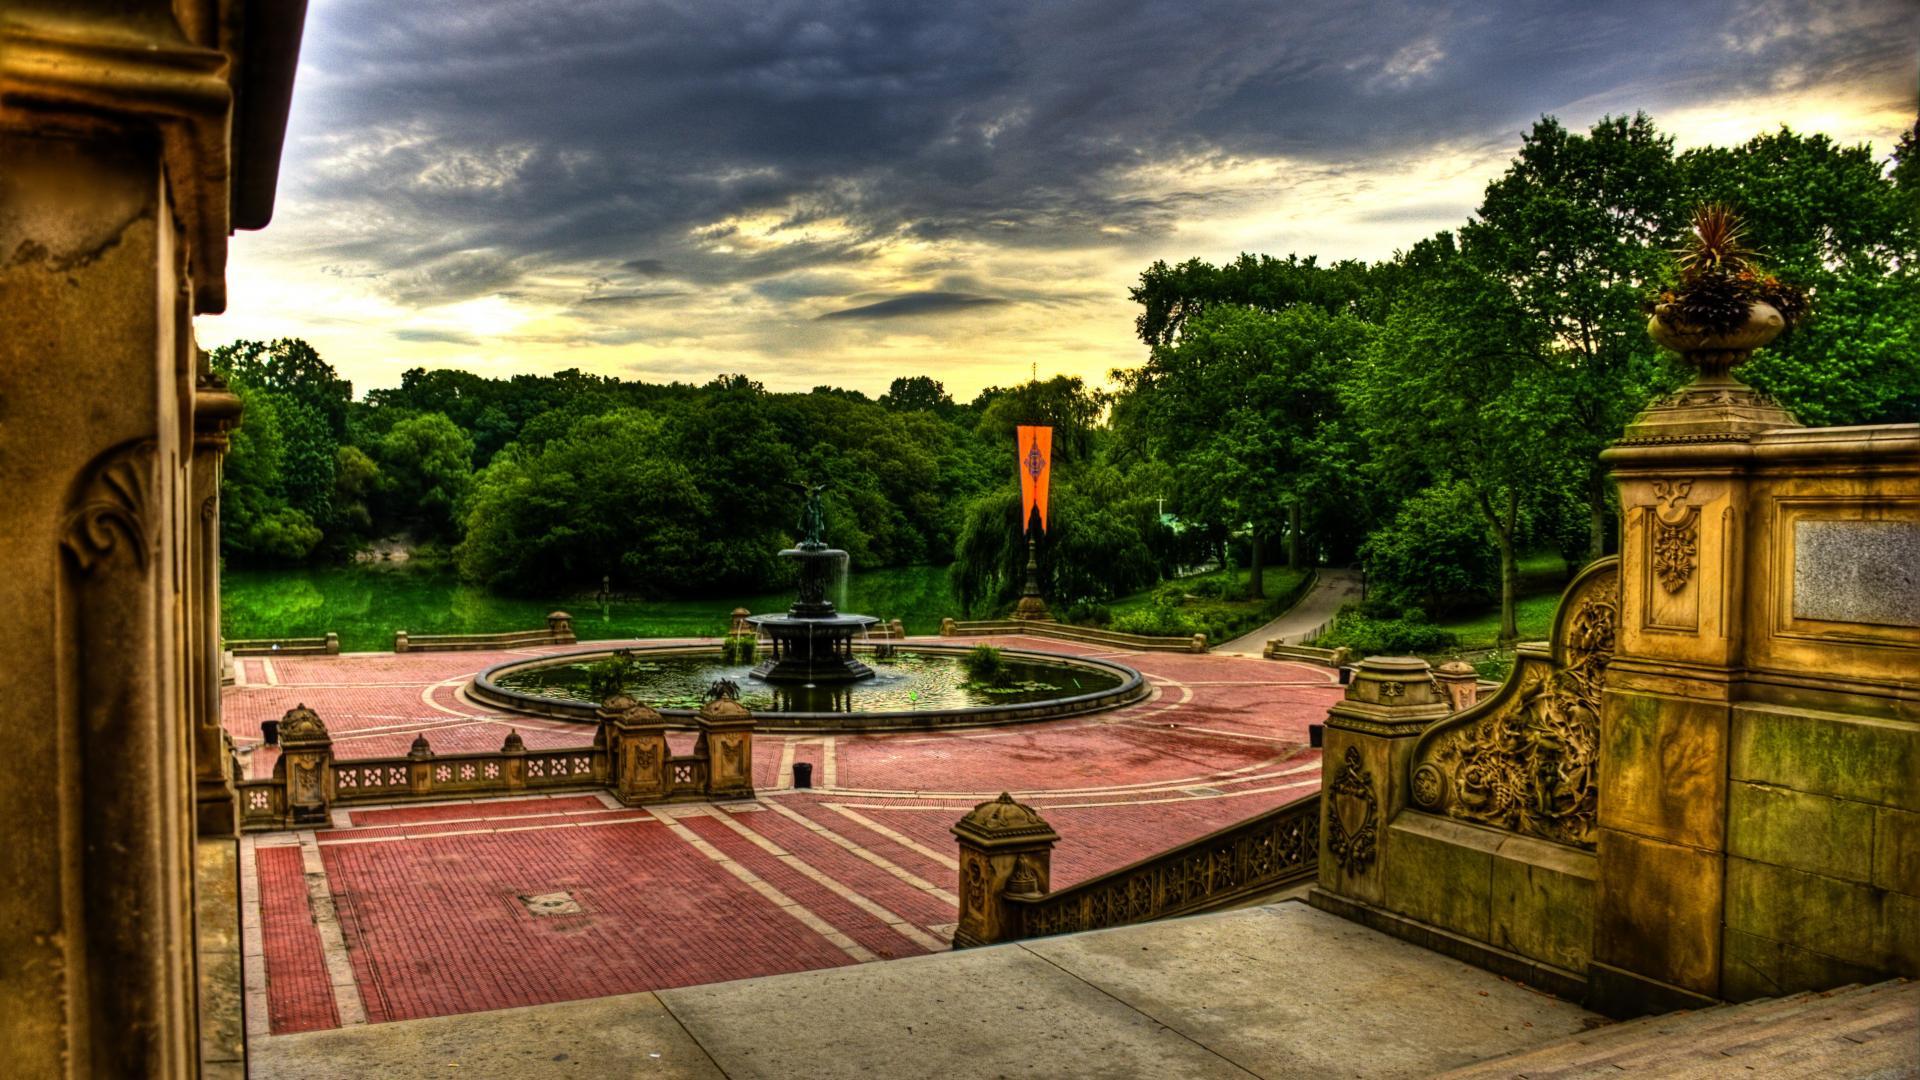 Central-Park-12.jpg